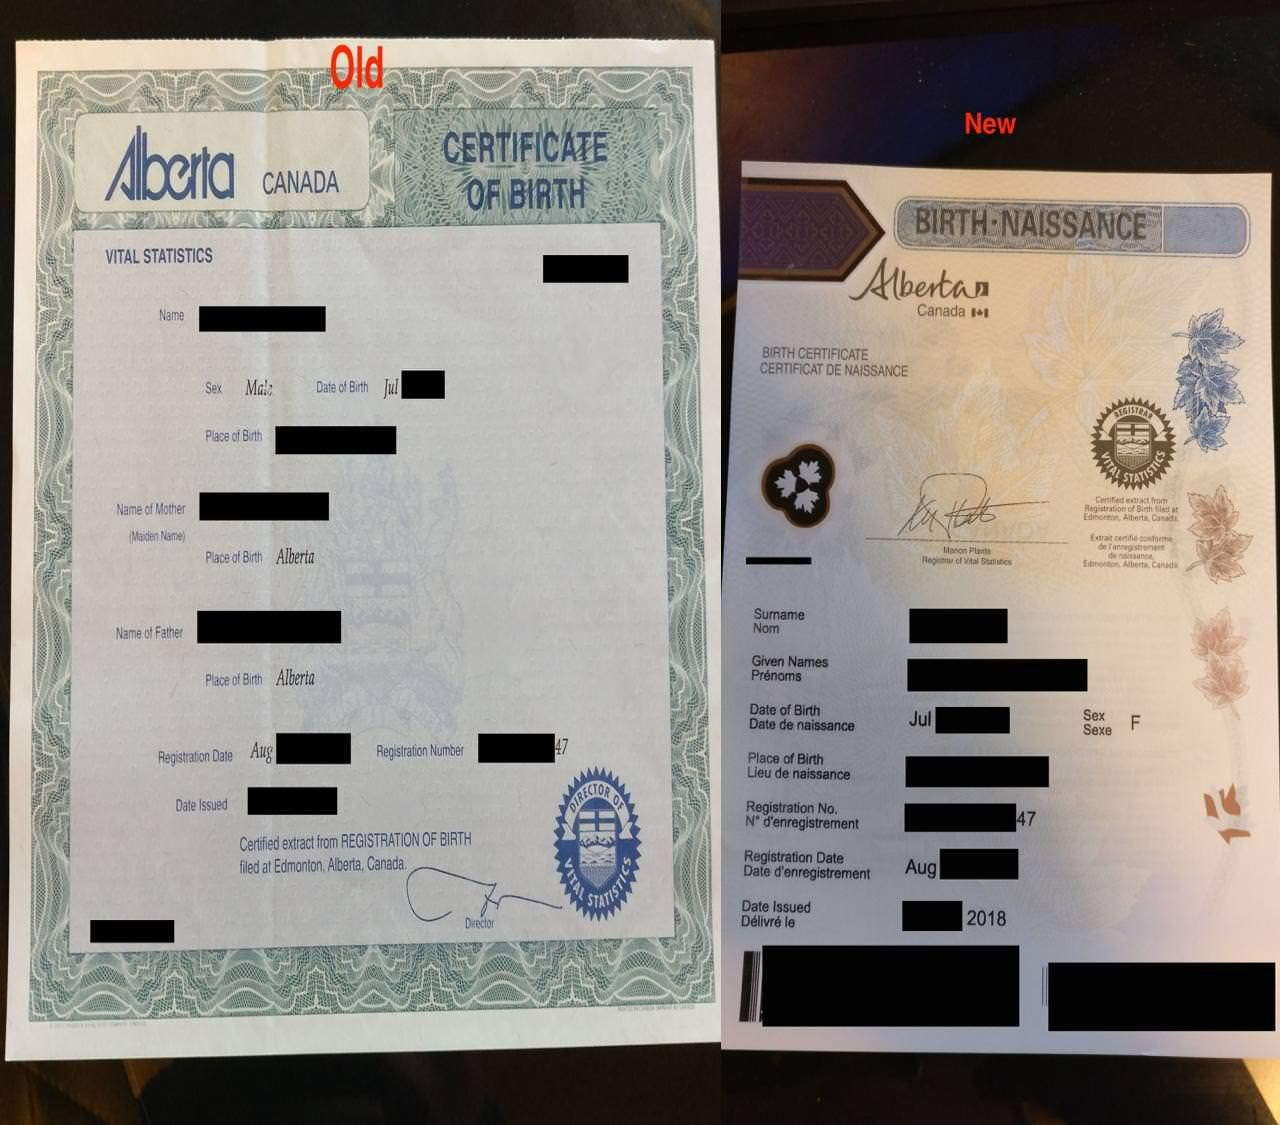 David's new birth certificate